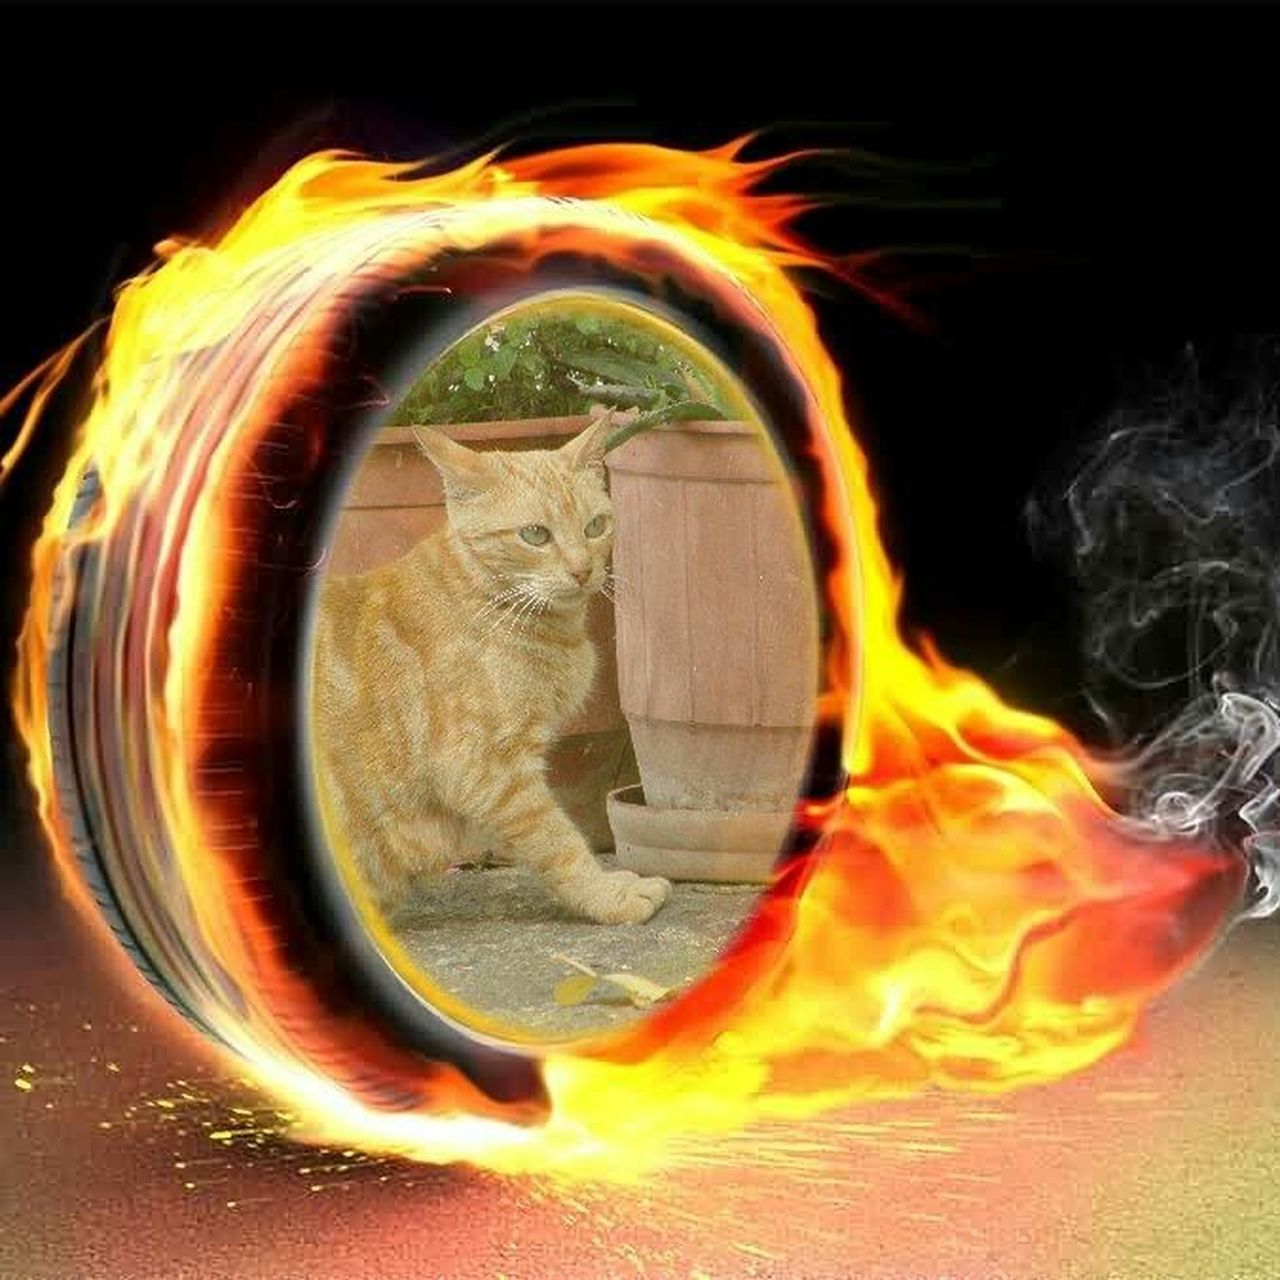 burning, flame, heat - temperature, orange color, motion, danger, no people, destruction, close-up, indoors, day